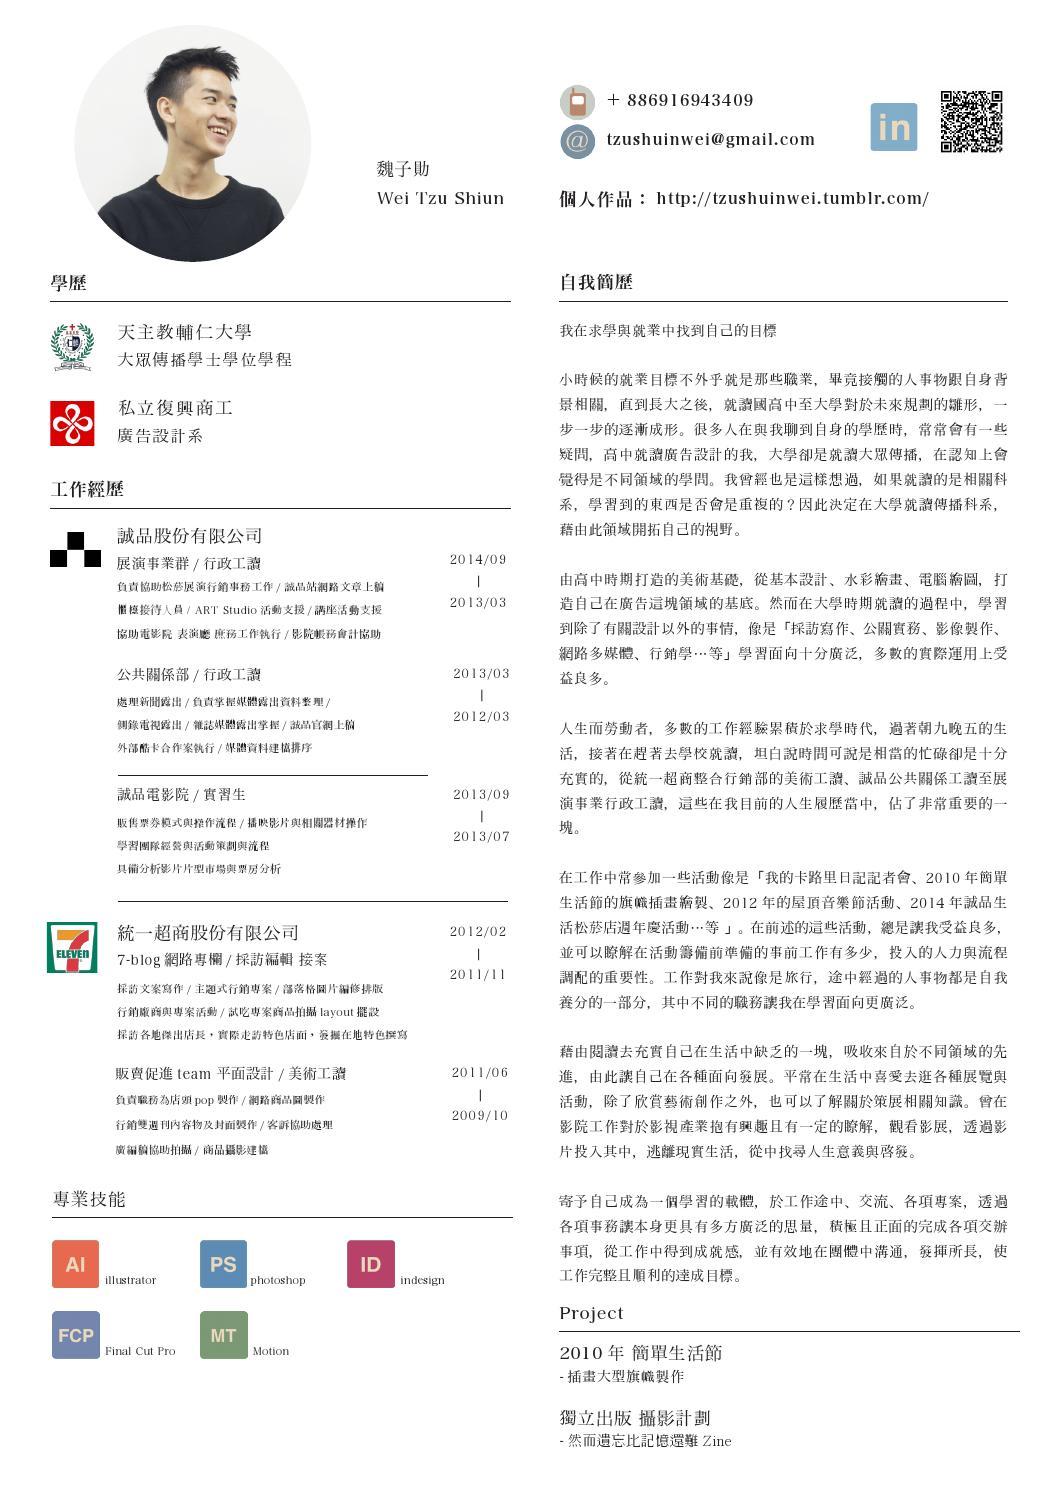 魏子勛履歷 by tzushuinwei - Issuu